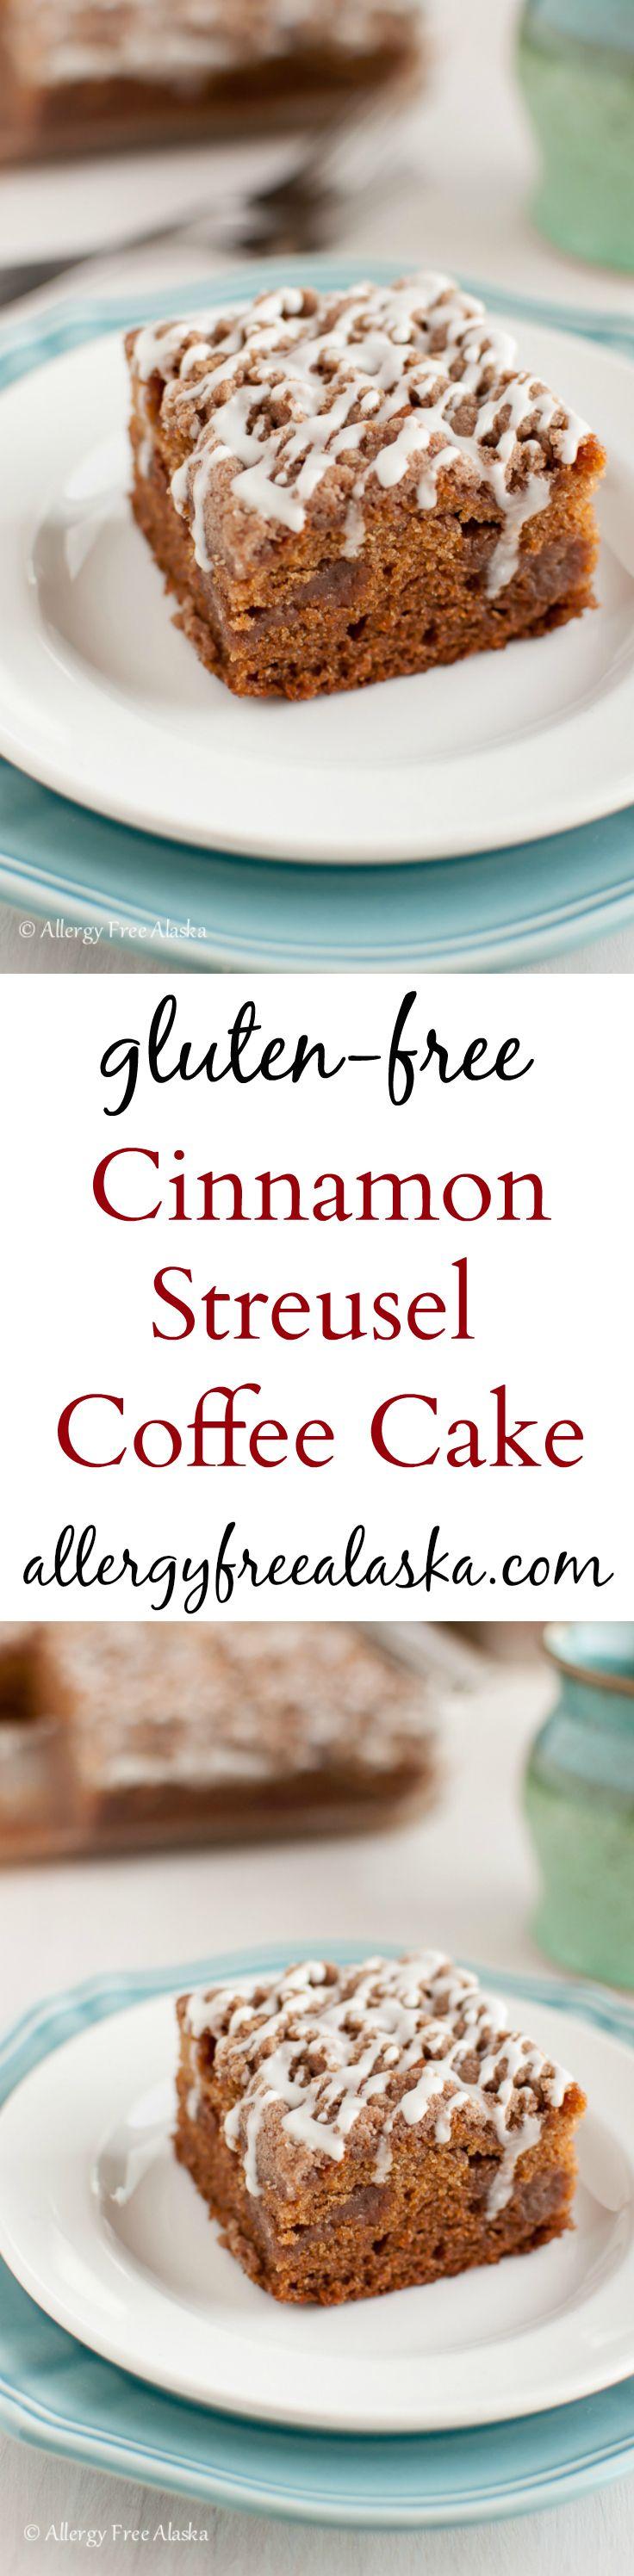 This is so, SO good! Cinnamon Streusel Coffee Cake {gluten-free, dairy-free} Recipe from Allergy Free Alaska